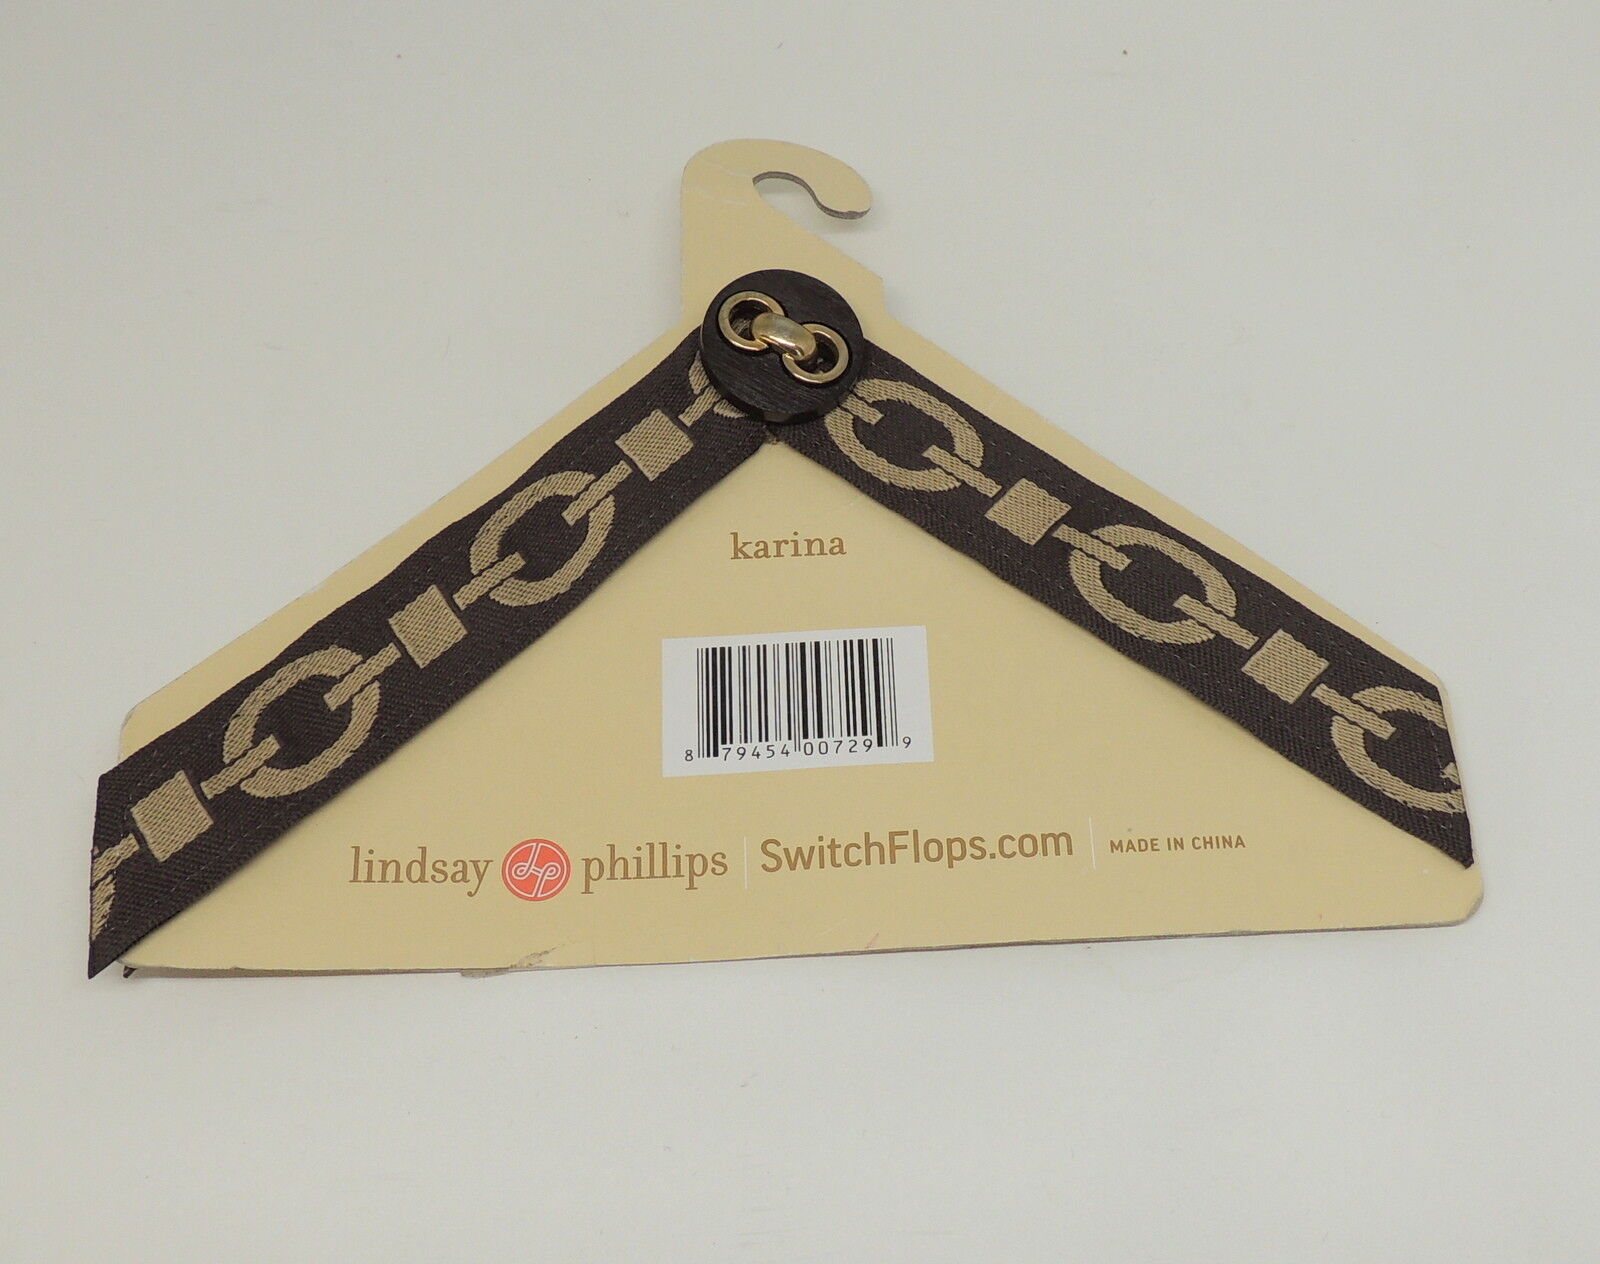 Lindsay Phillips Switchflops KARINA Brown Chain 9 10 11 New Flip Flop Strap